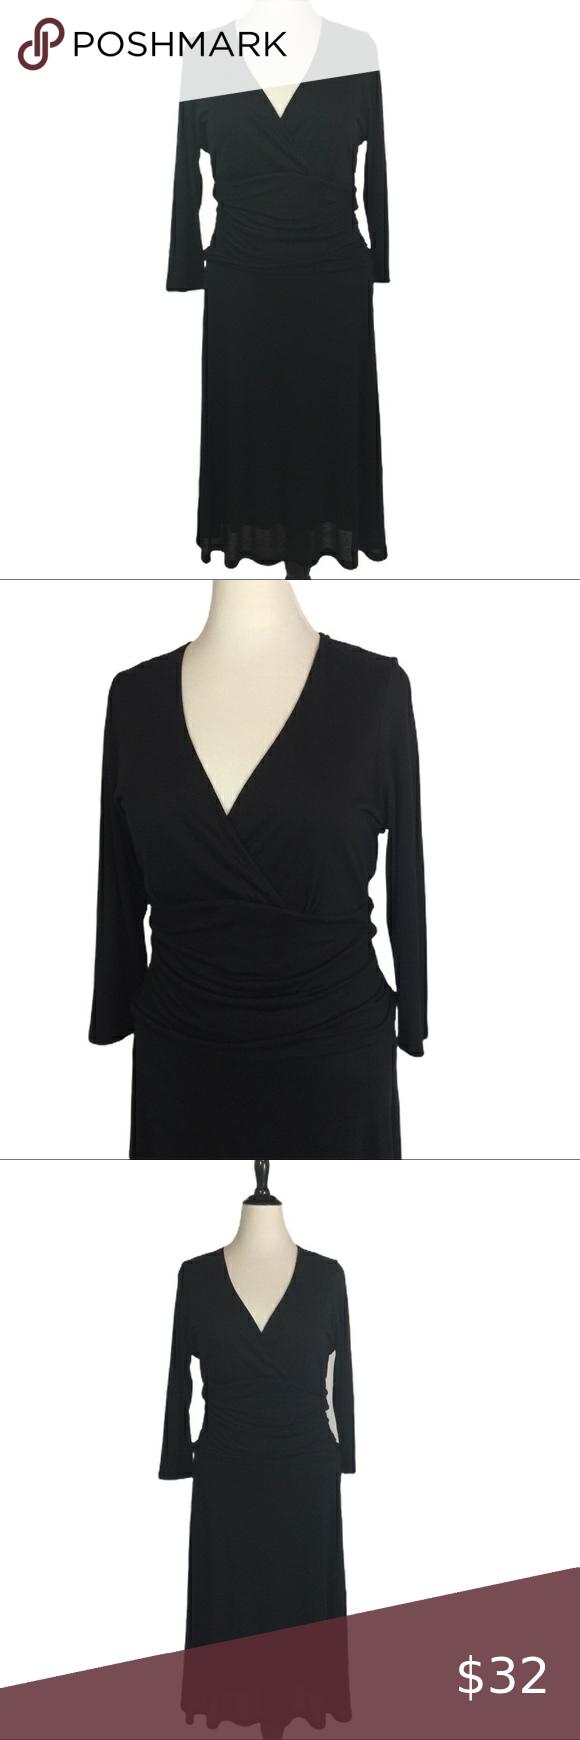 Boden Little Black Dress 18 R Lyocell Knit Ruched Little Black Dress Pullover Designs Black Dress [ 1740 x 580 Pixel ]